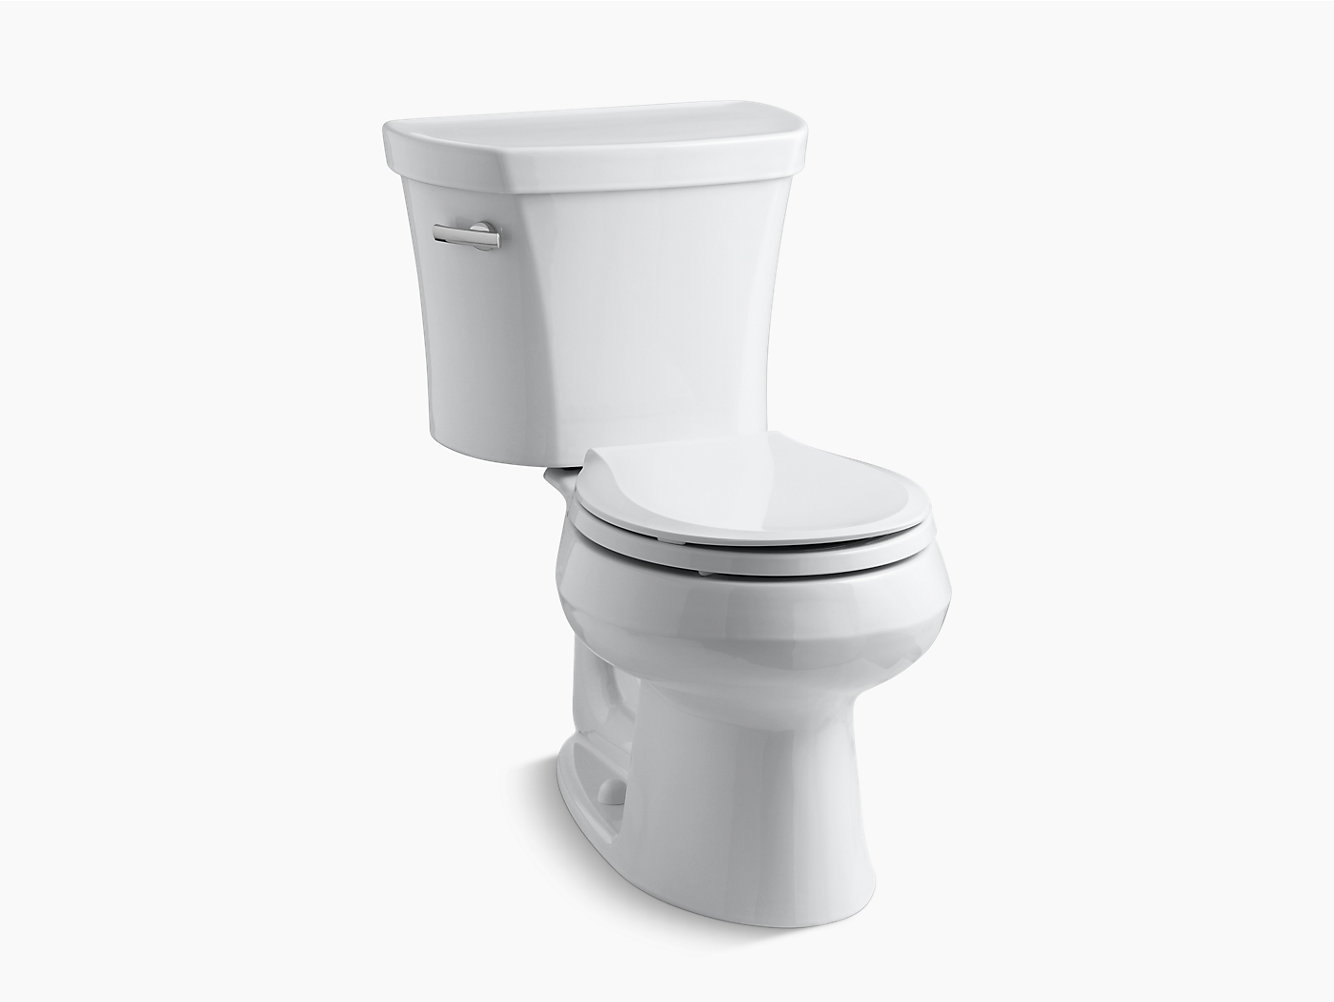 KOHLER|K-3947|Wellworth Two-Piece Round-Front 1.28-GPF Toilet | KOHLER